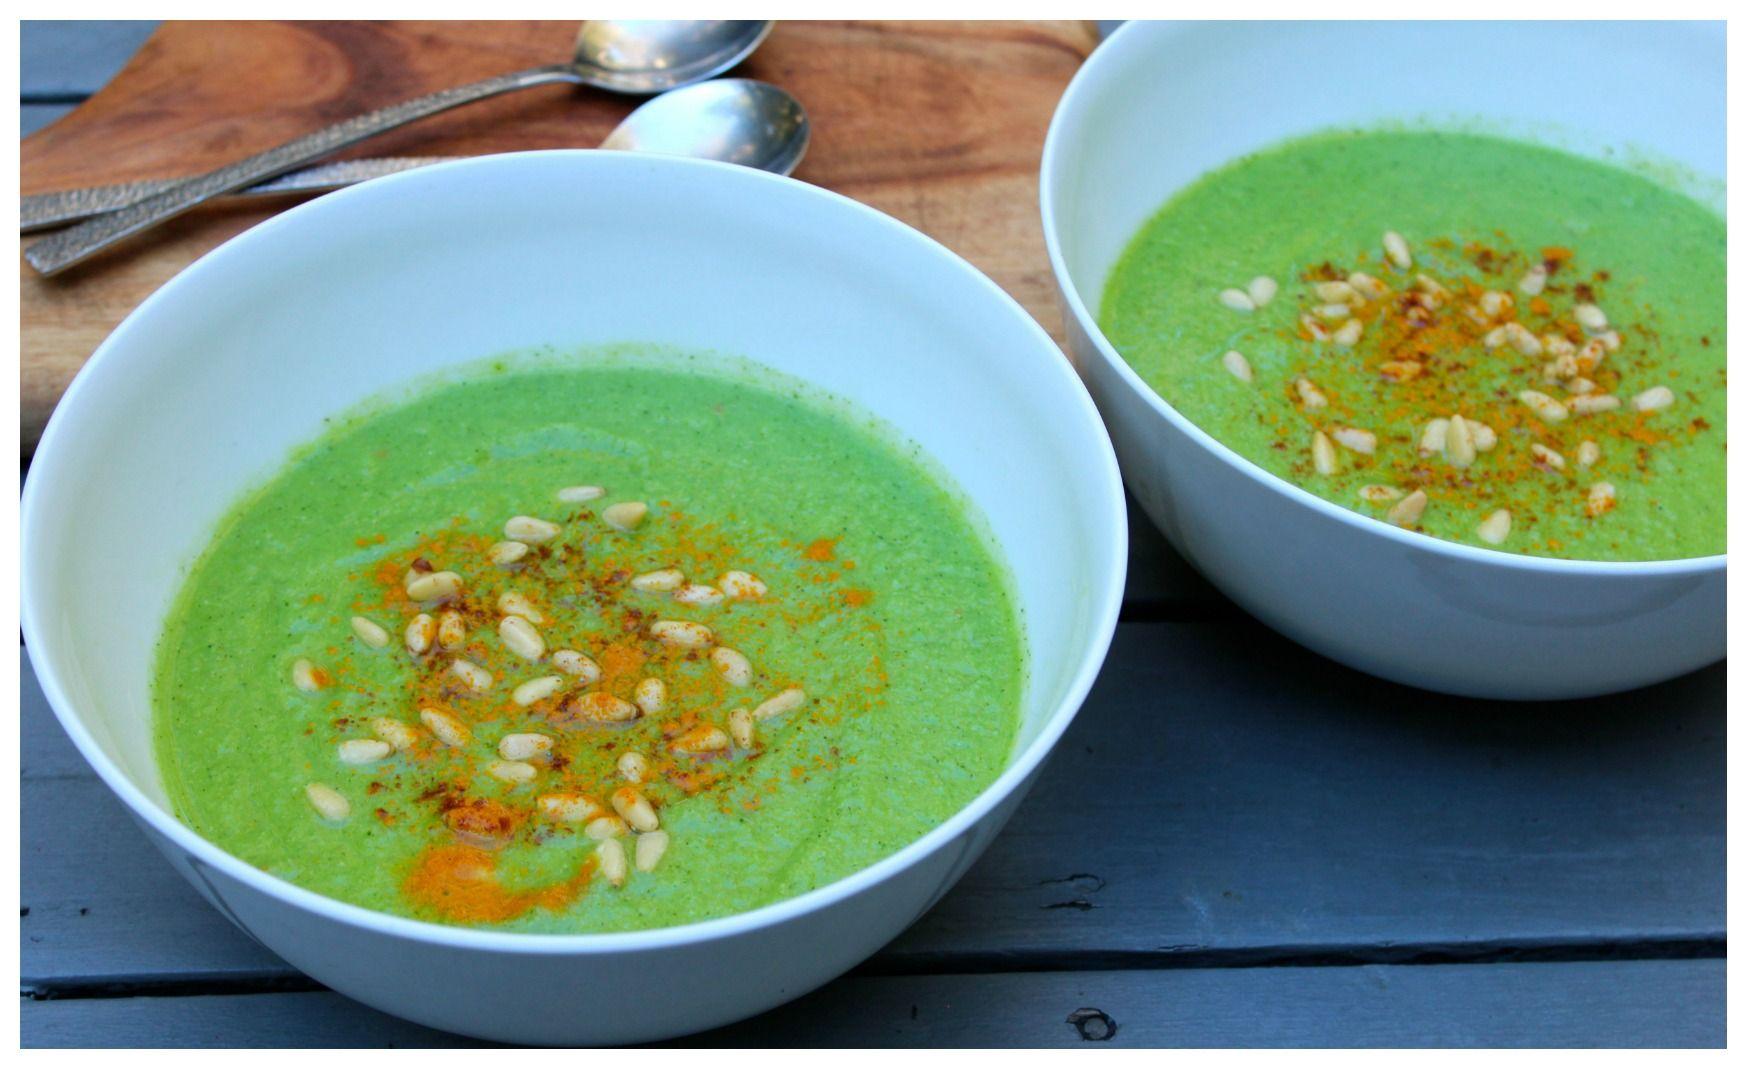 Zuppe detox: 3 idee facilissime dai food blog